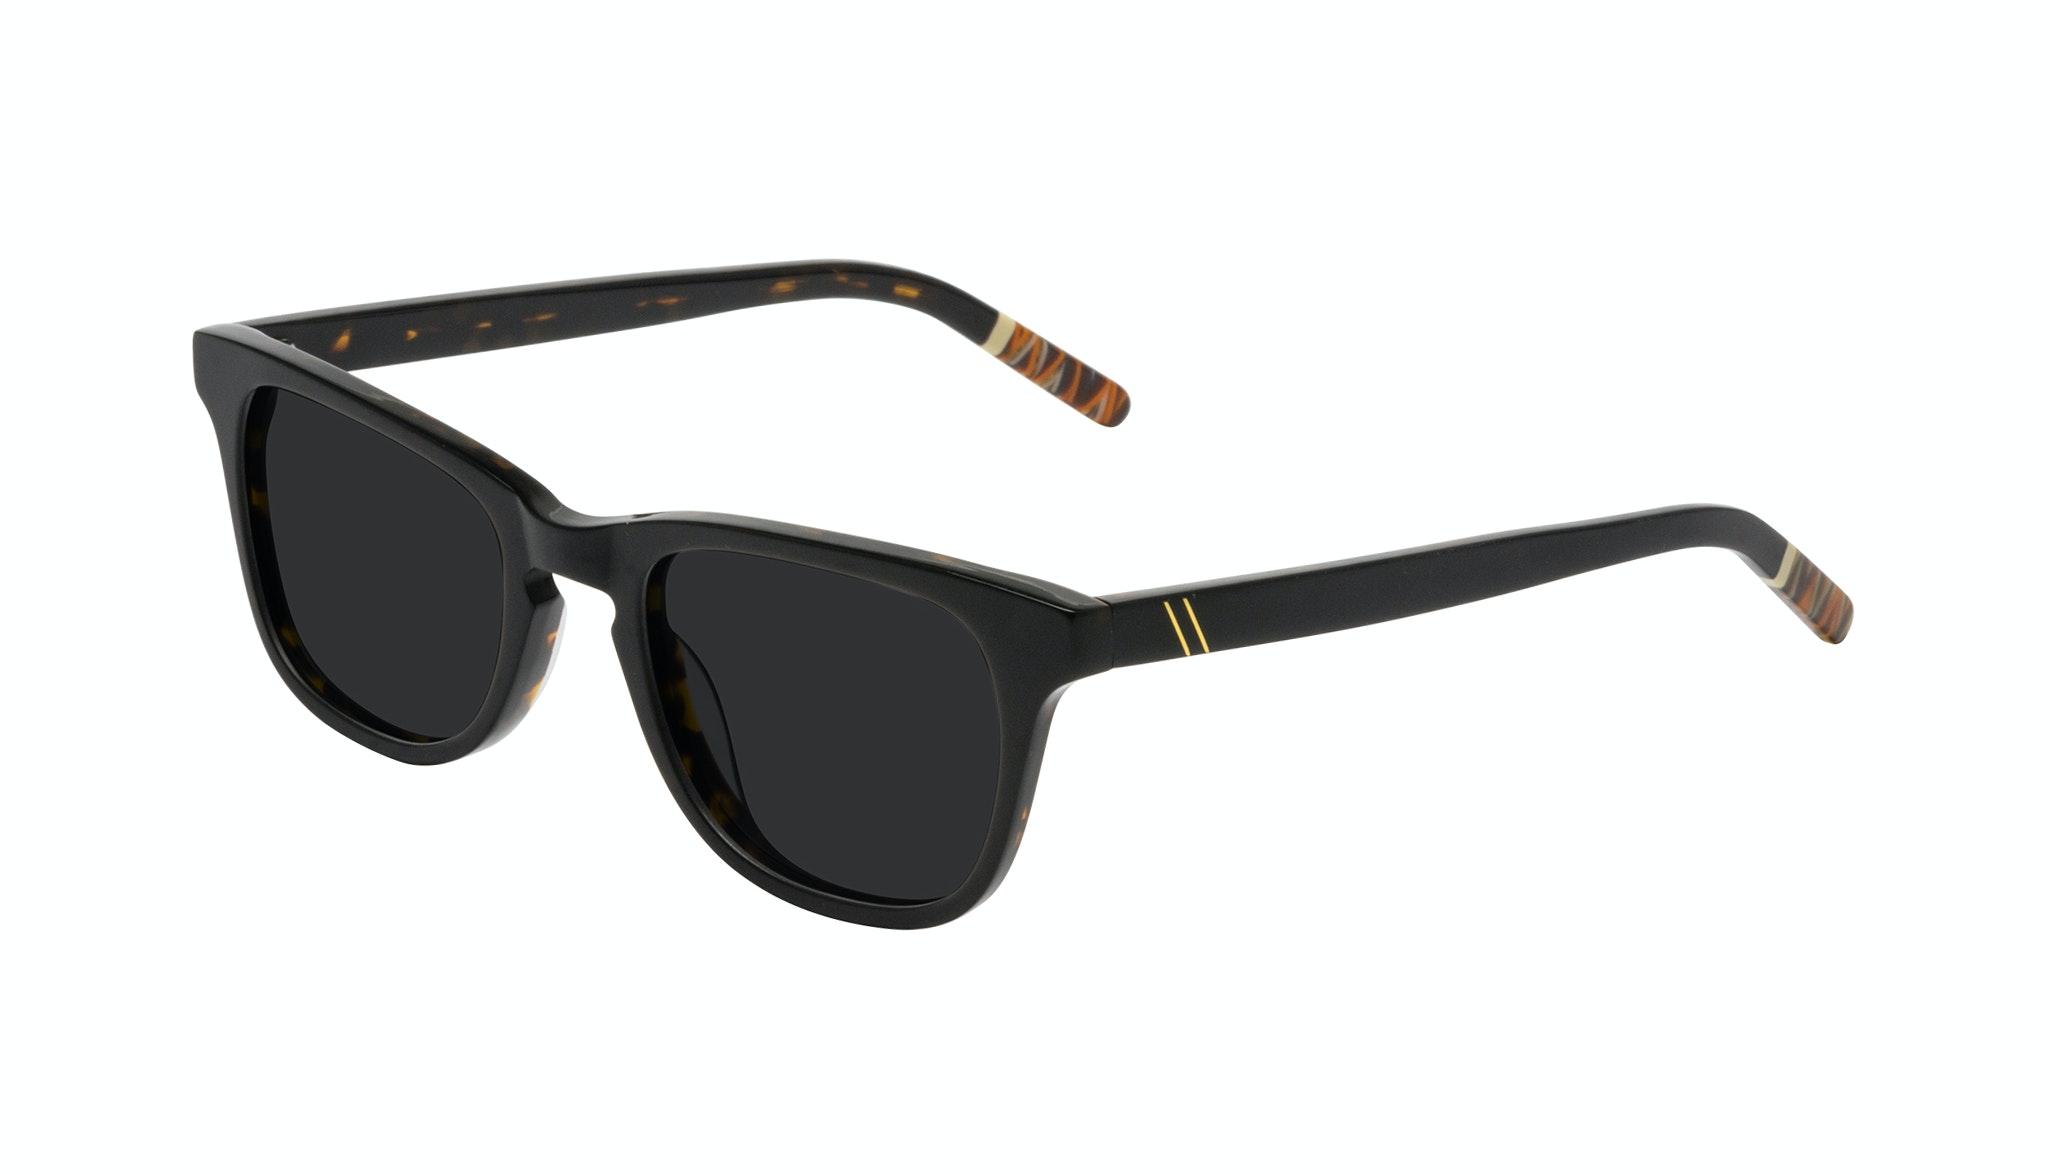 Affordable Fashion Glasses Rectangle Sunglasses Men Trust Black Tort Tilt